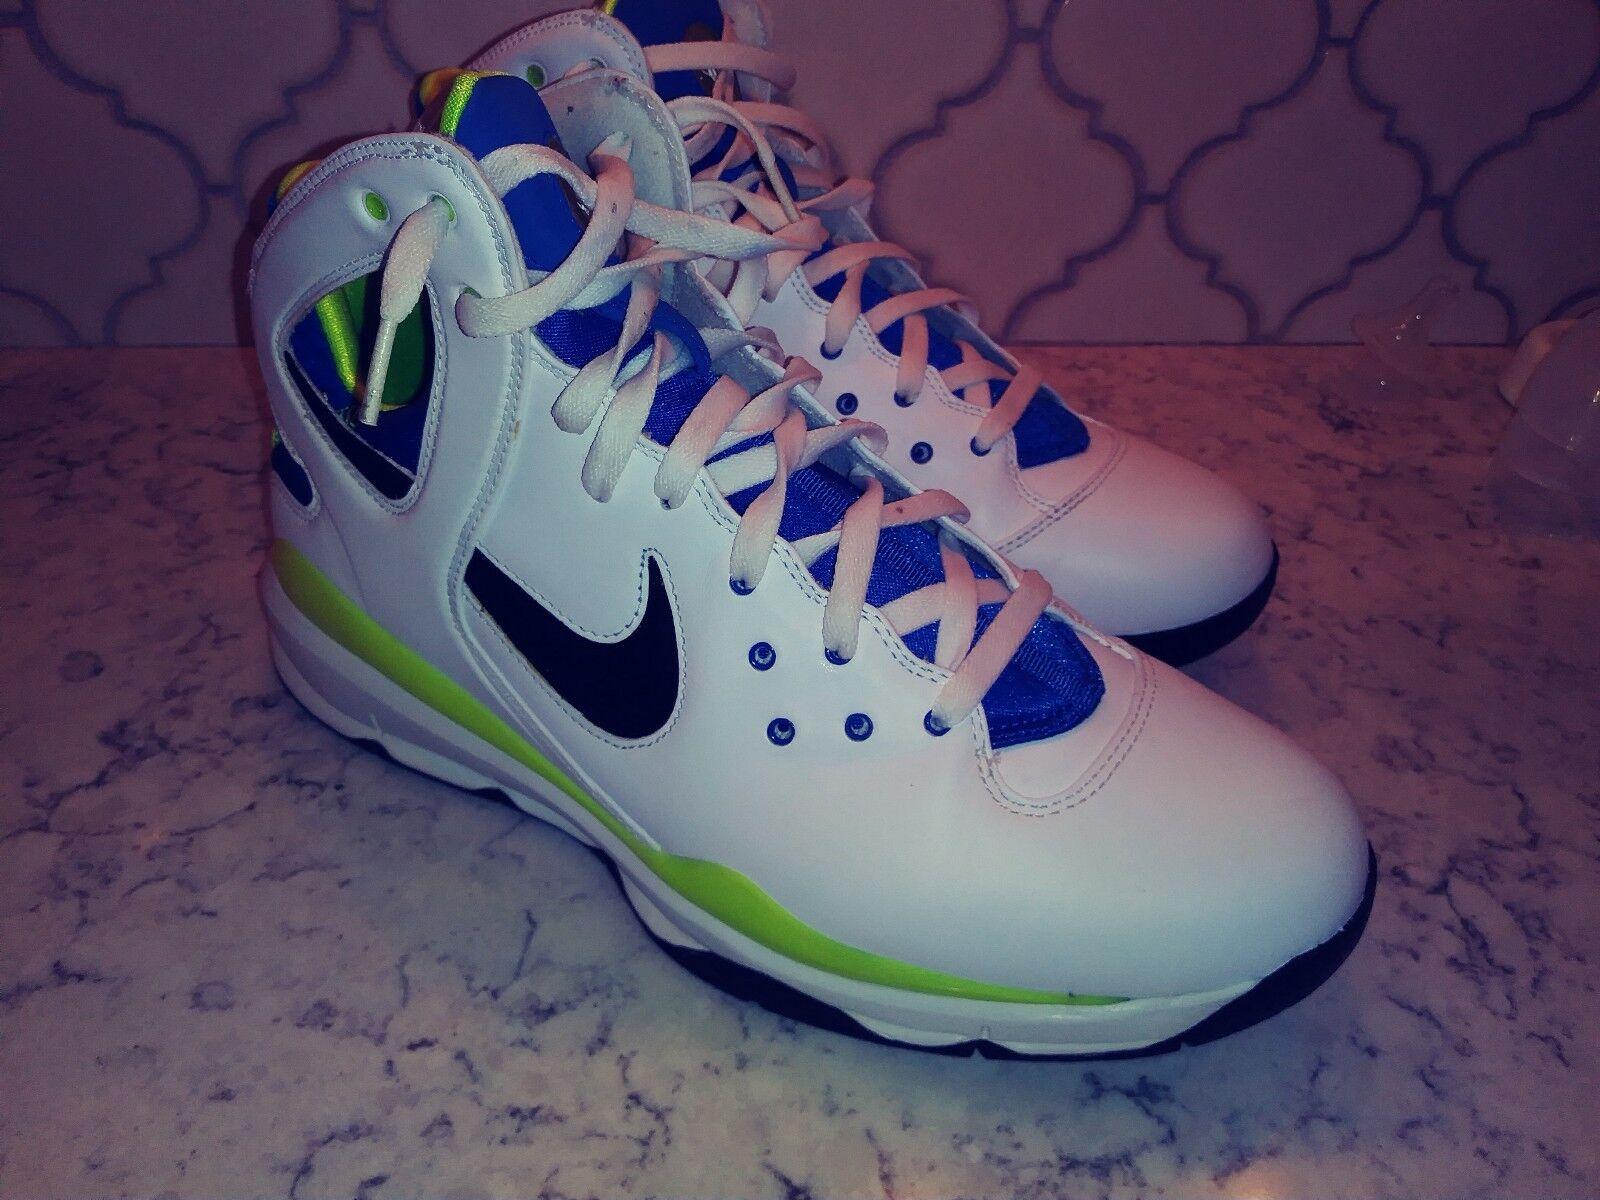 Nike Hurache 08 Retro. Size 11.5